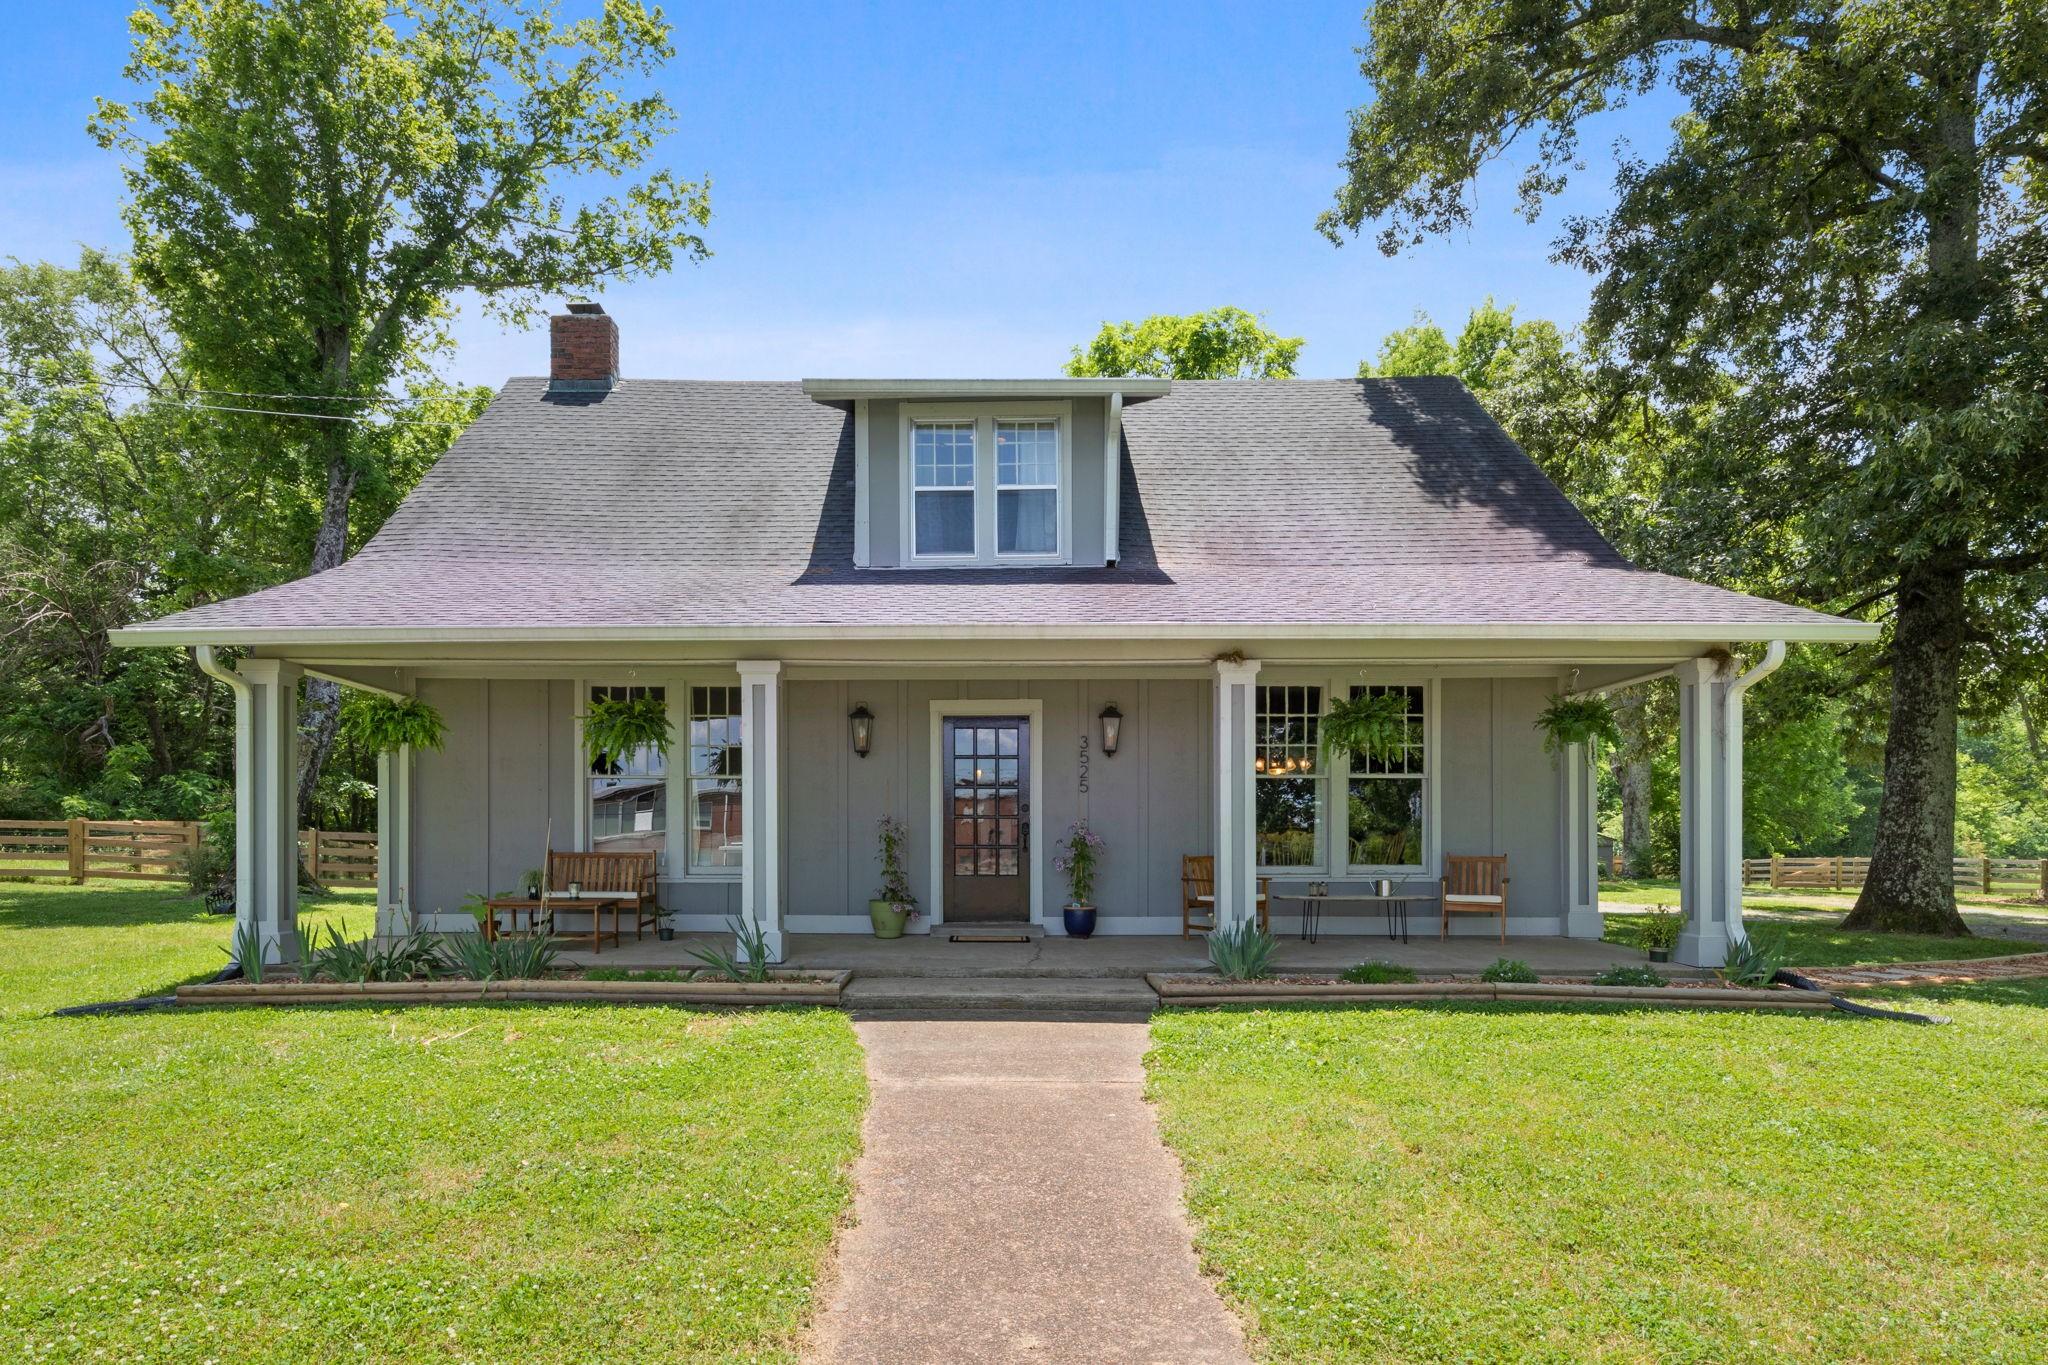 3525 Old Clarksville Pike, Joelton, TN 37080 - Joelton, TN real estate listing